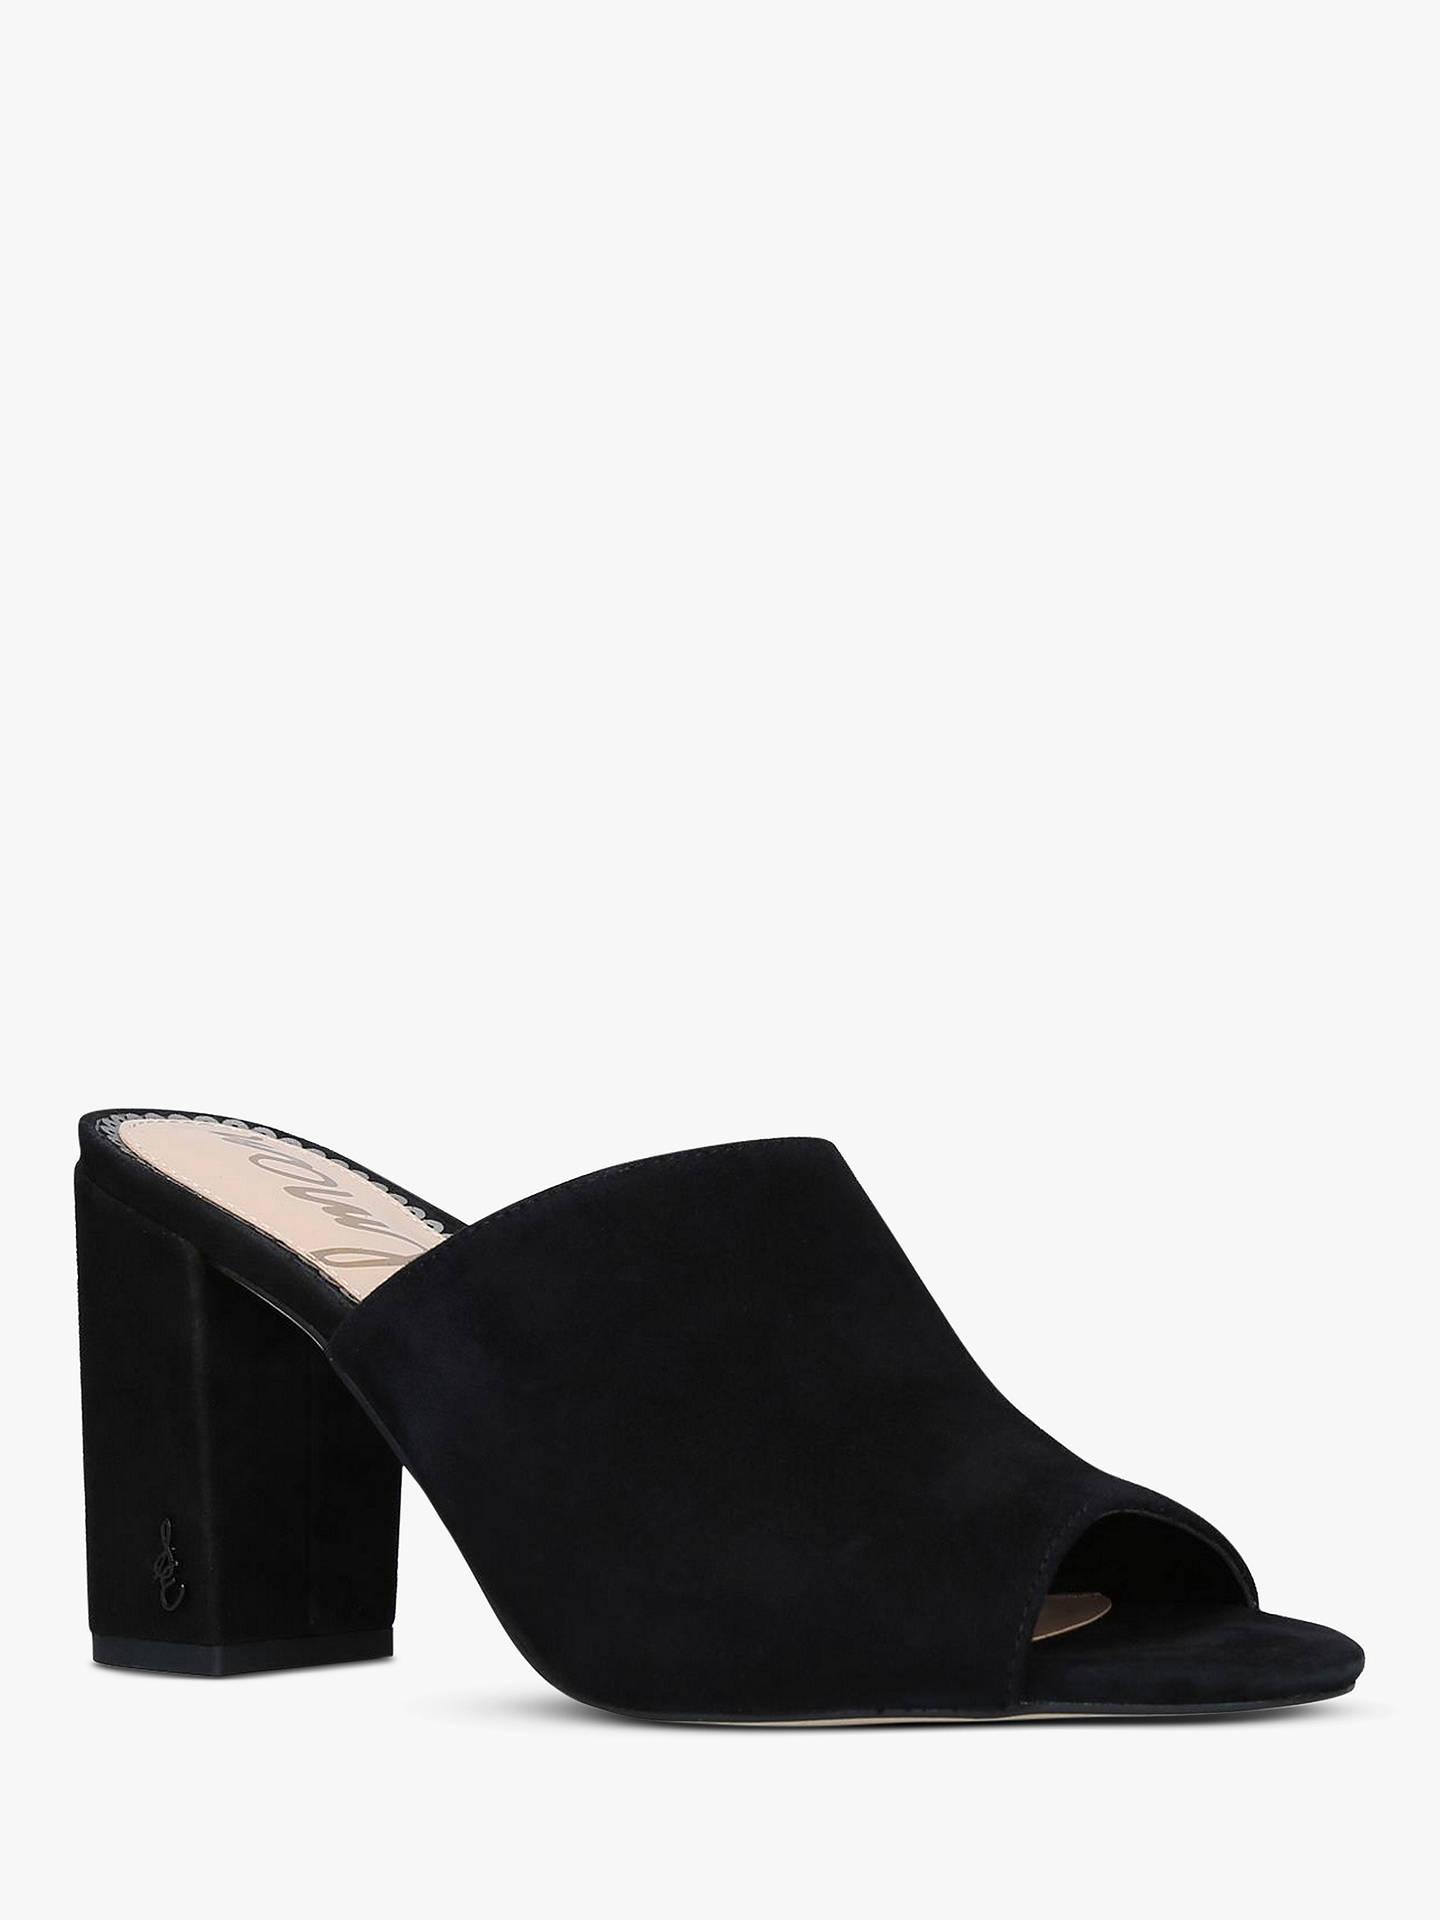 003665e343e ... Buy Sam Edelman Orlie Suede Block Heel Mule Sandals